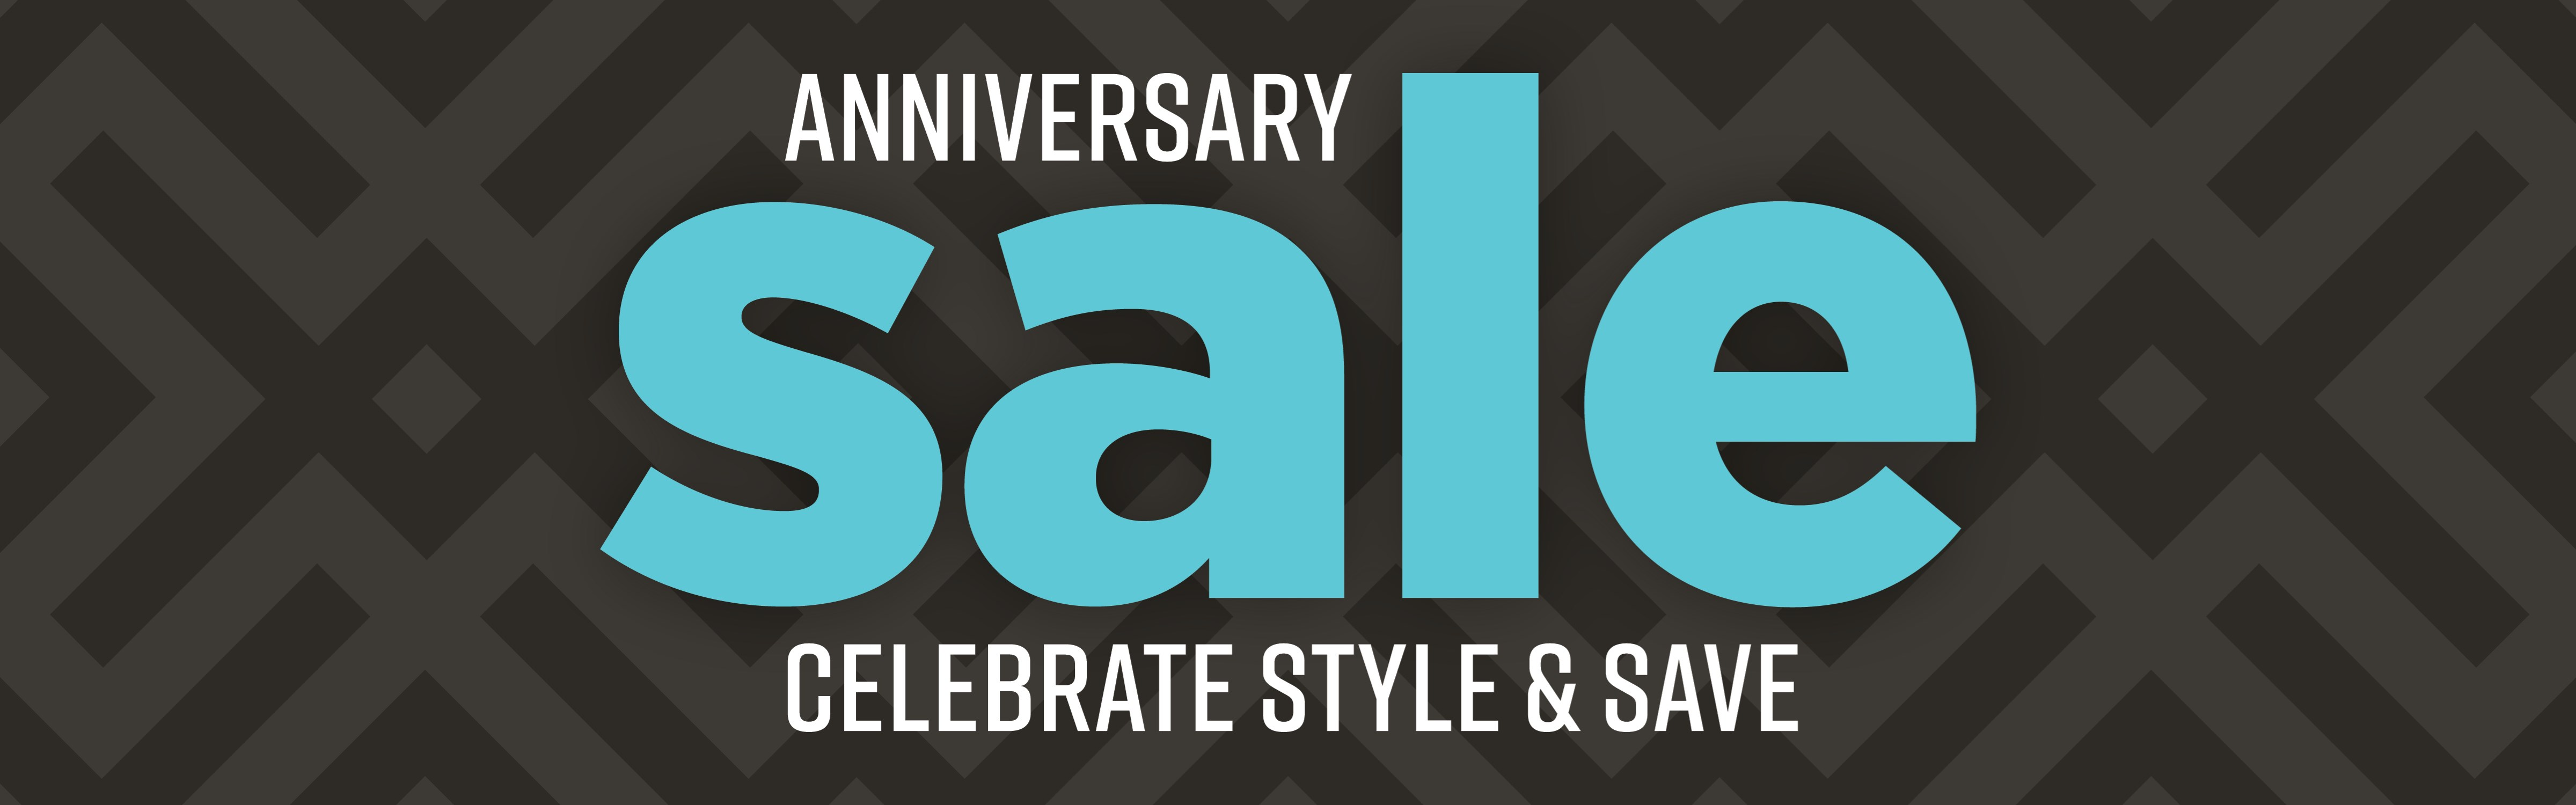 0419_Anniversary_Sale